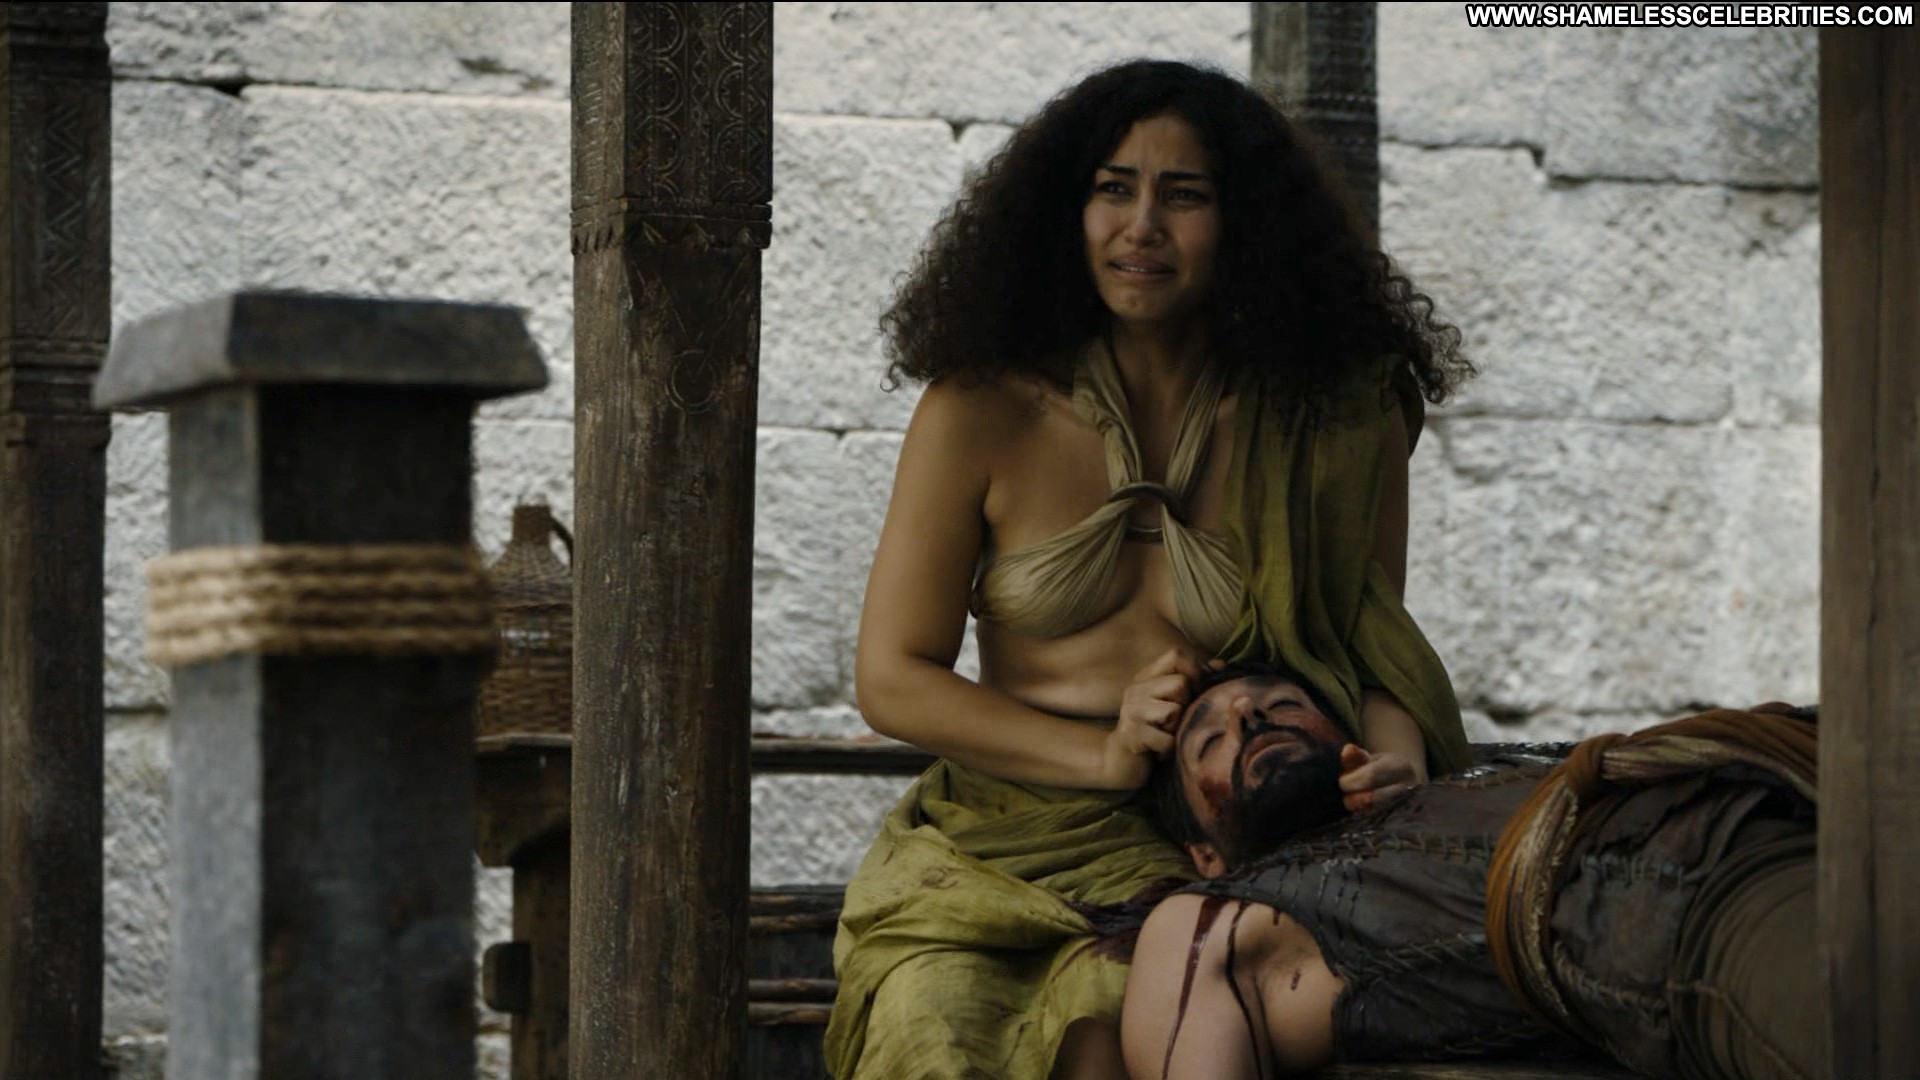 Emilia clarke nude in voice from the stone scandalplanetcom 6